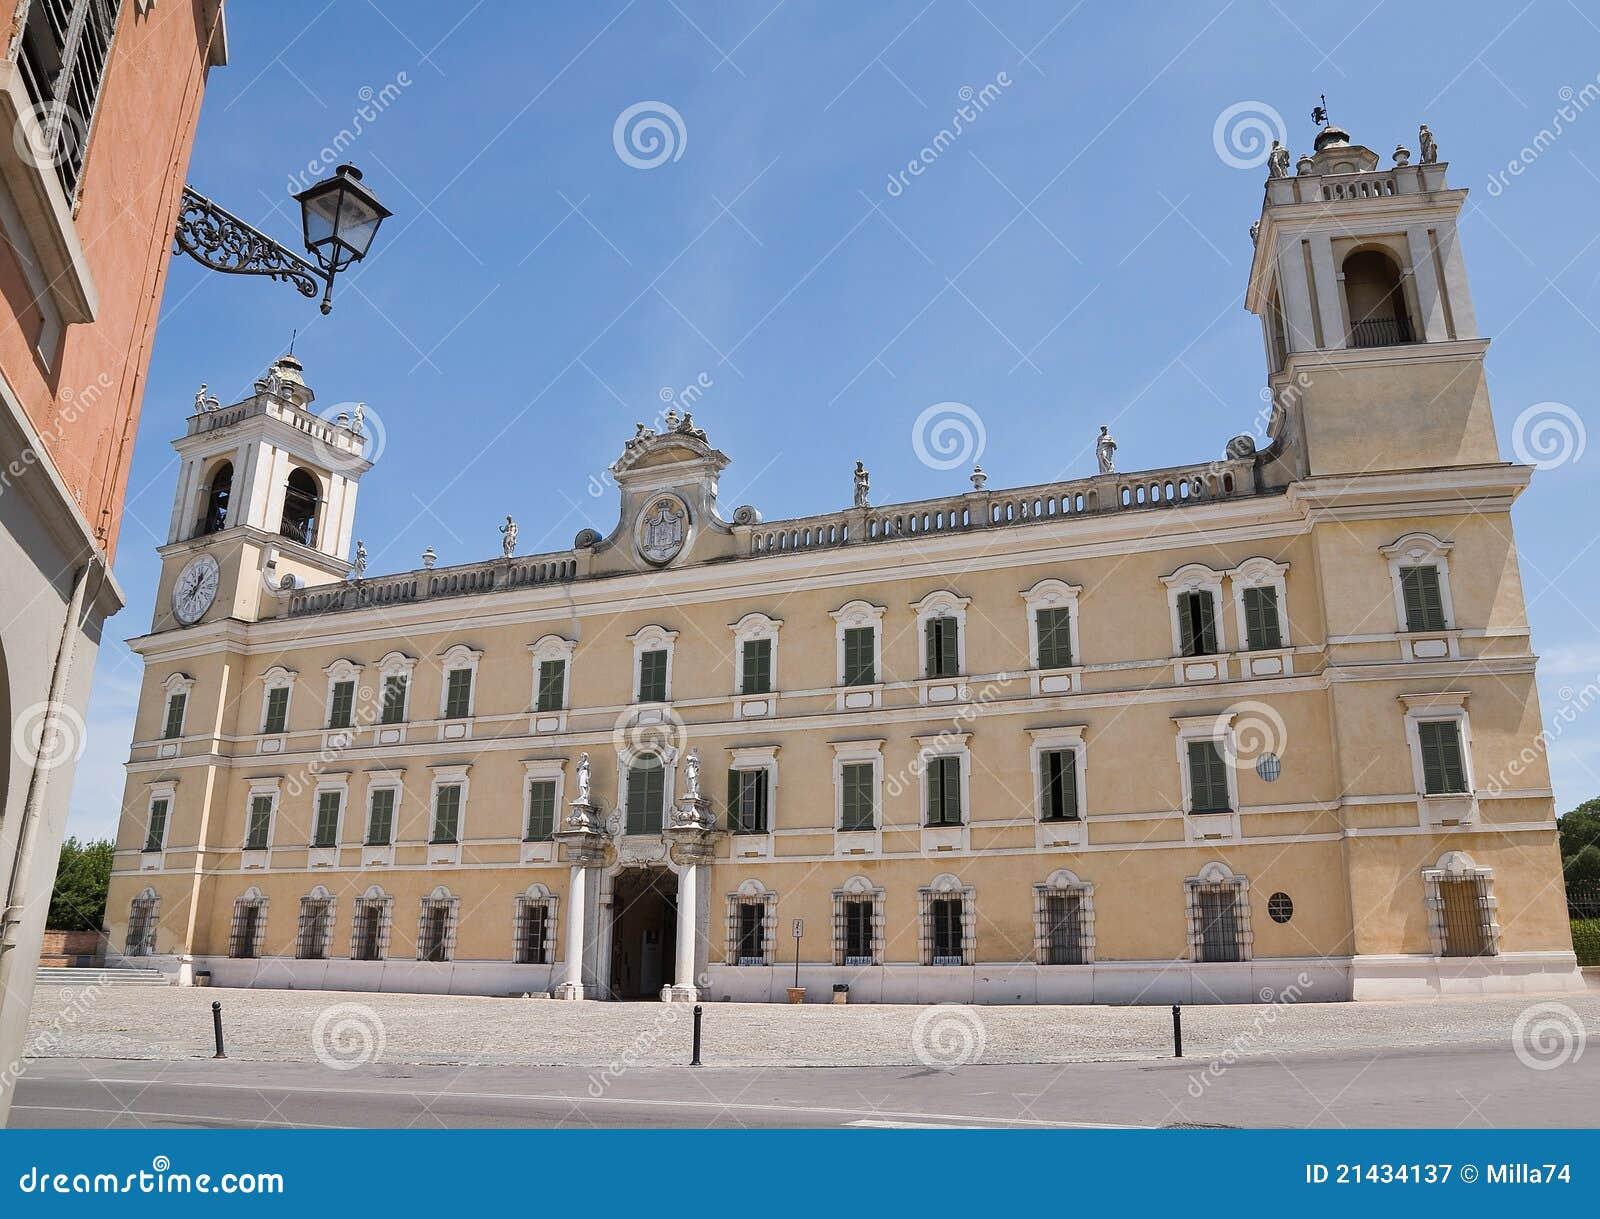 Palacio ducal de Colorno. Emilia-Romagna. Italia.